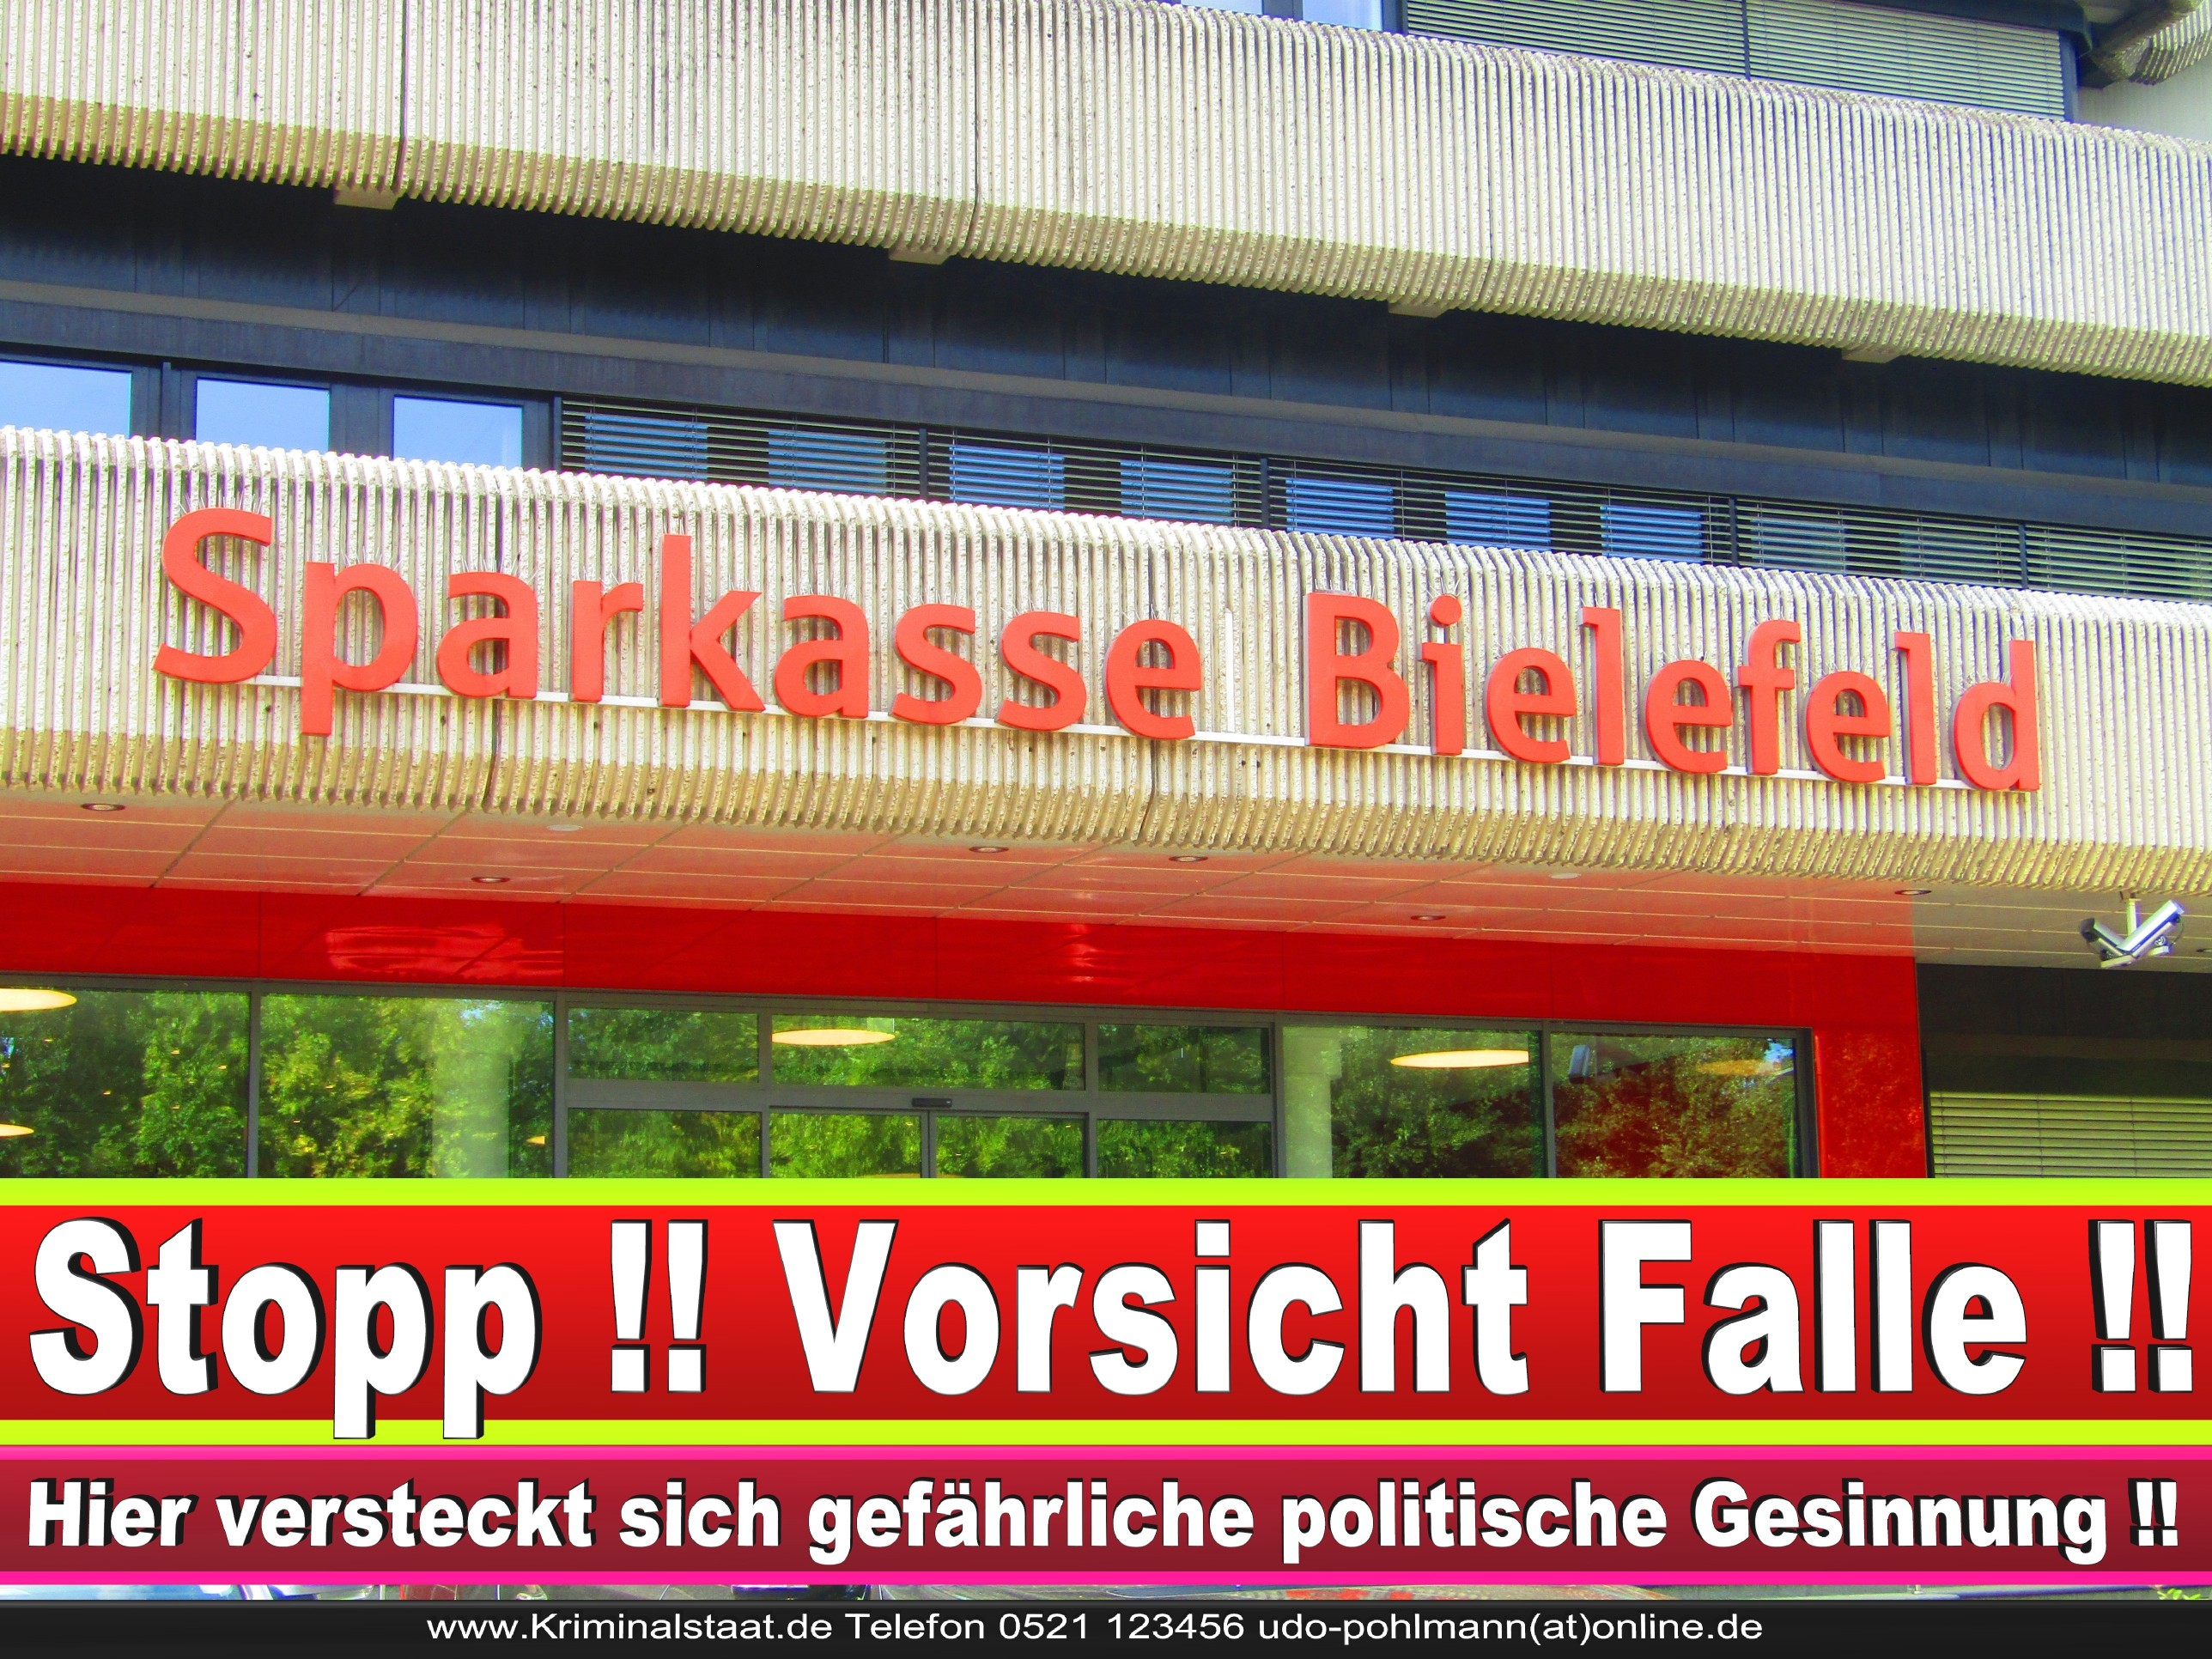 SPARKASSE BIELEFELD ANDREAS RÜTHER CDU BIELEFELD 3 LANDTAGSWAHL BUNDESTAGSWAHL BÜRGERMEISTERWAHL